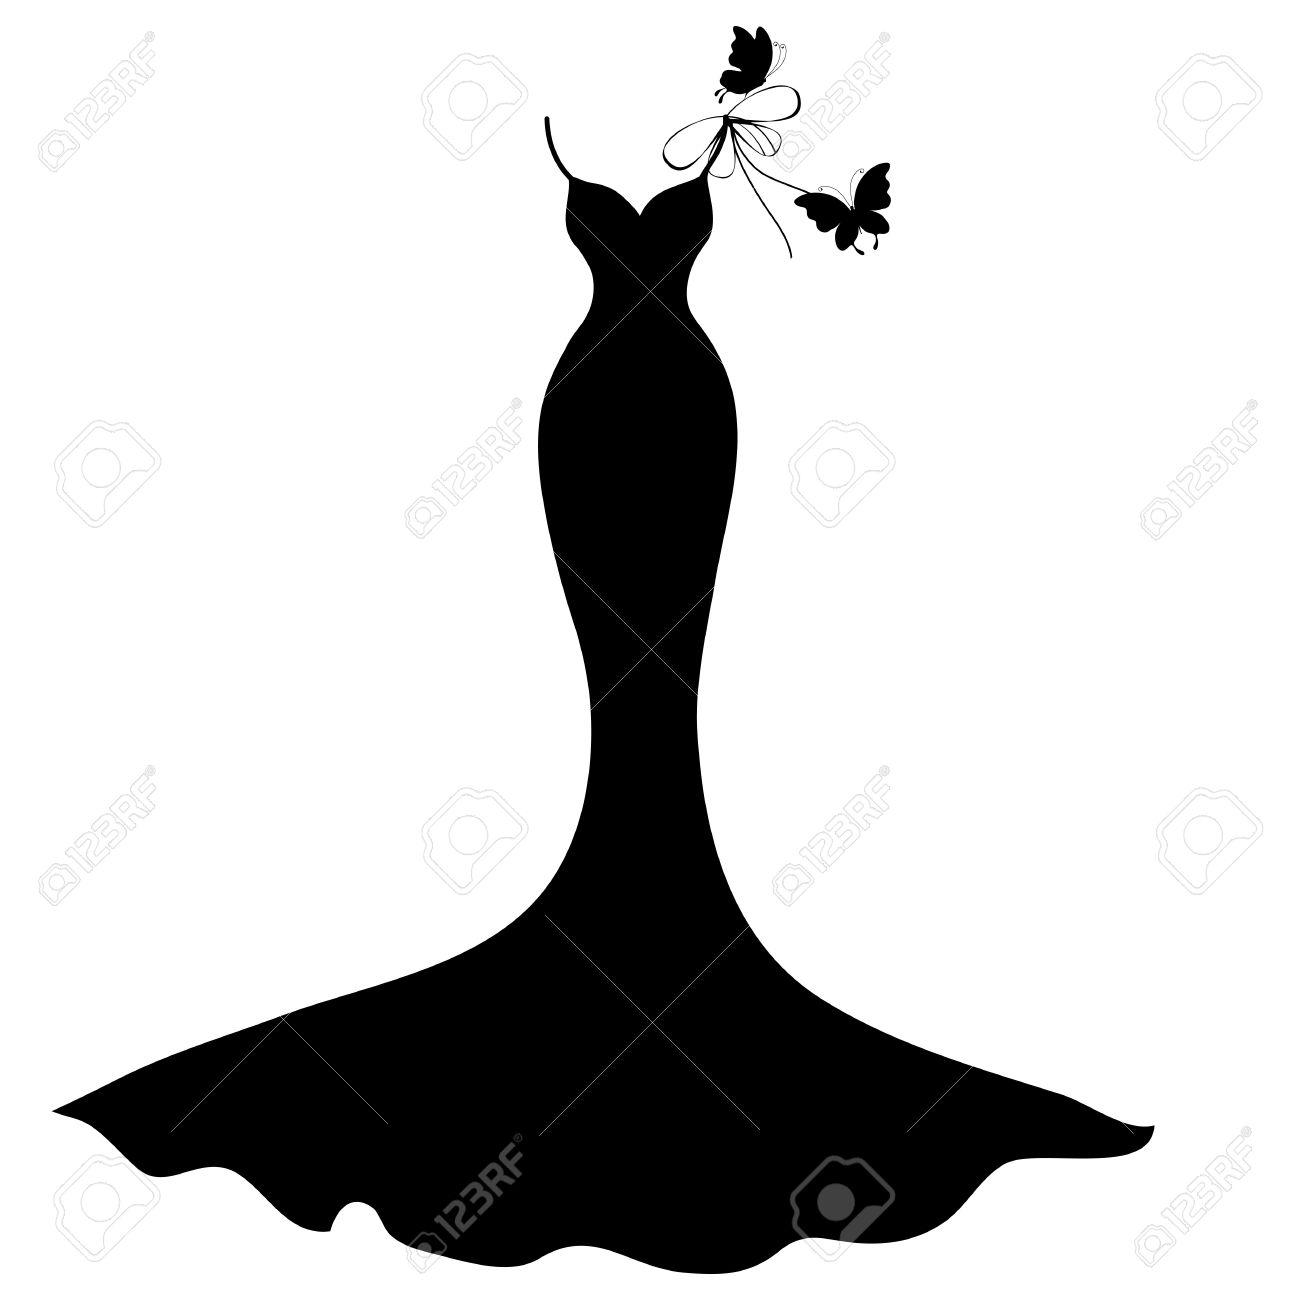 Black Dress Silhouette.